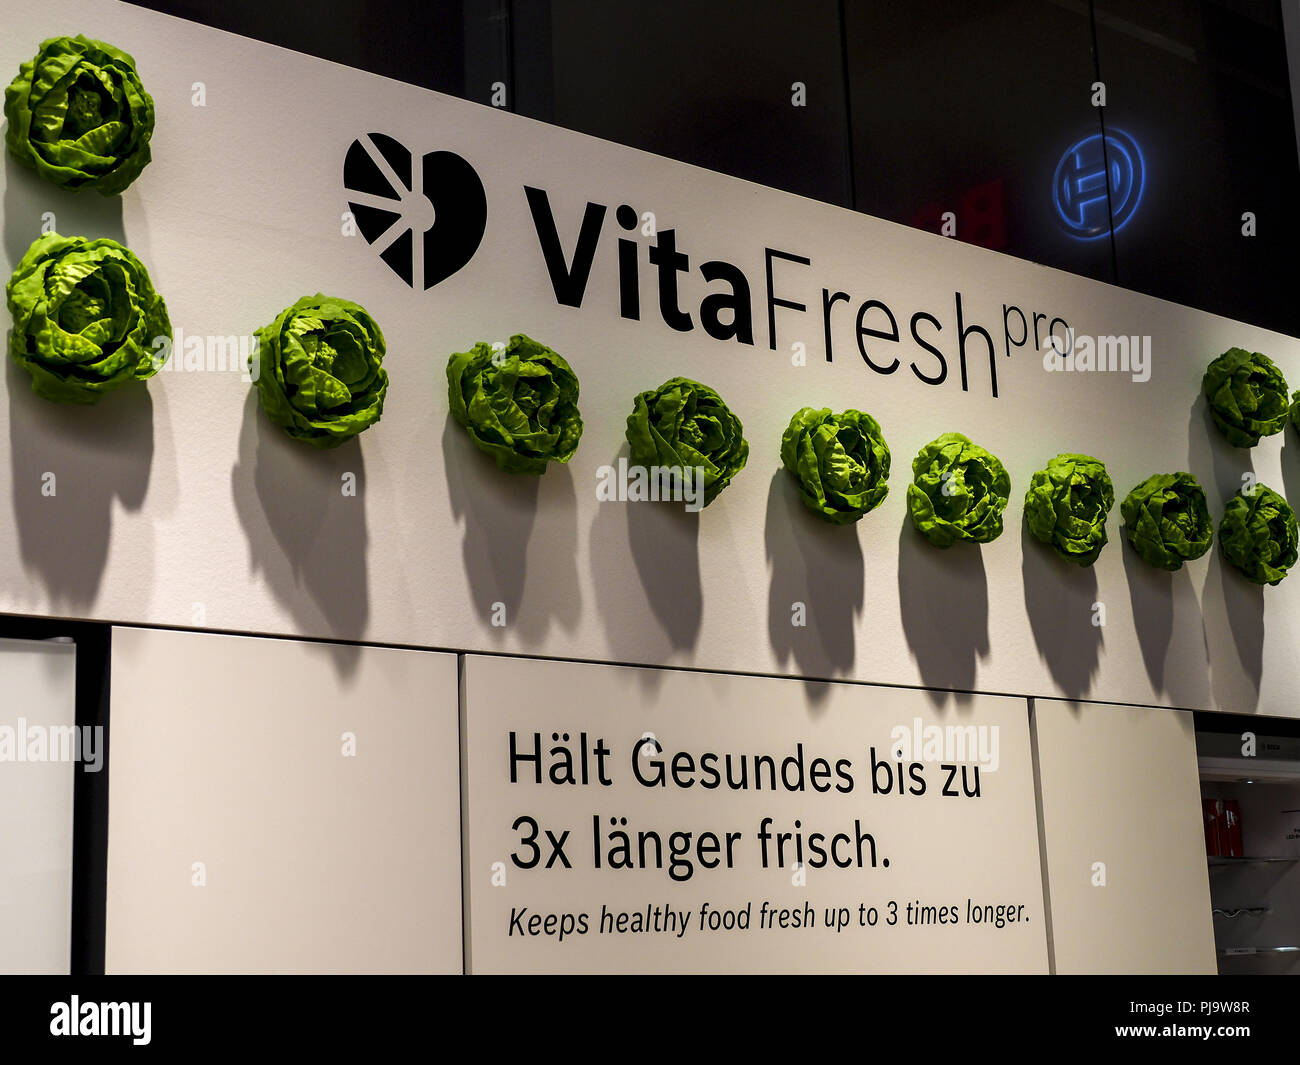 Bosch Kühlschrank Vitafresh : Bosch vitafresh kühlschrank ifa 2018 berlin internationale